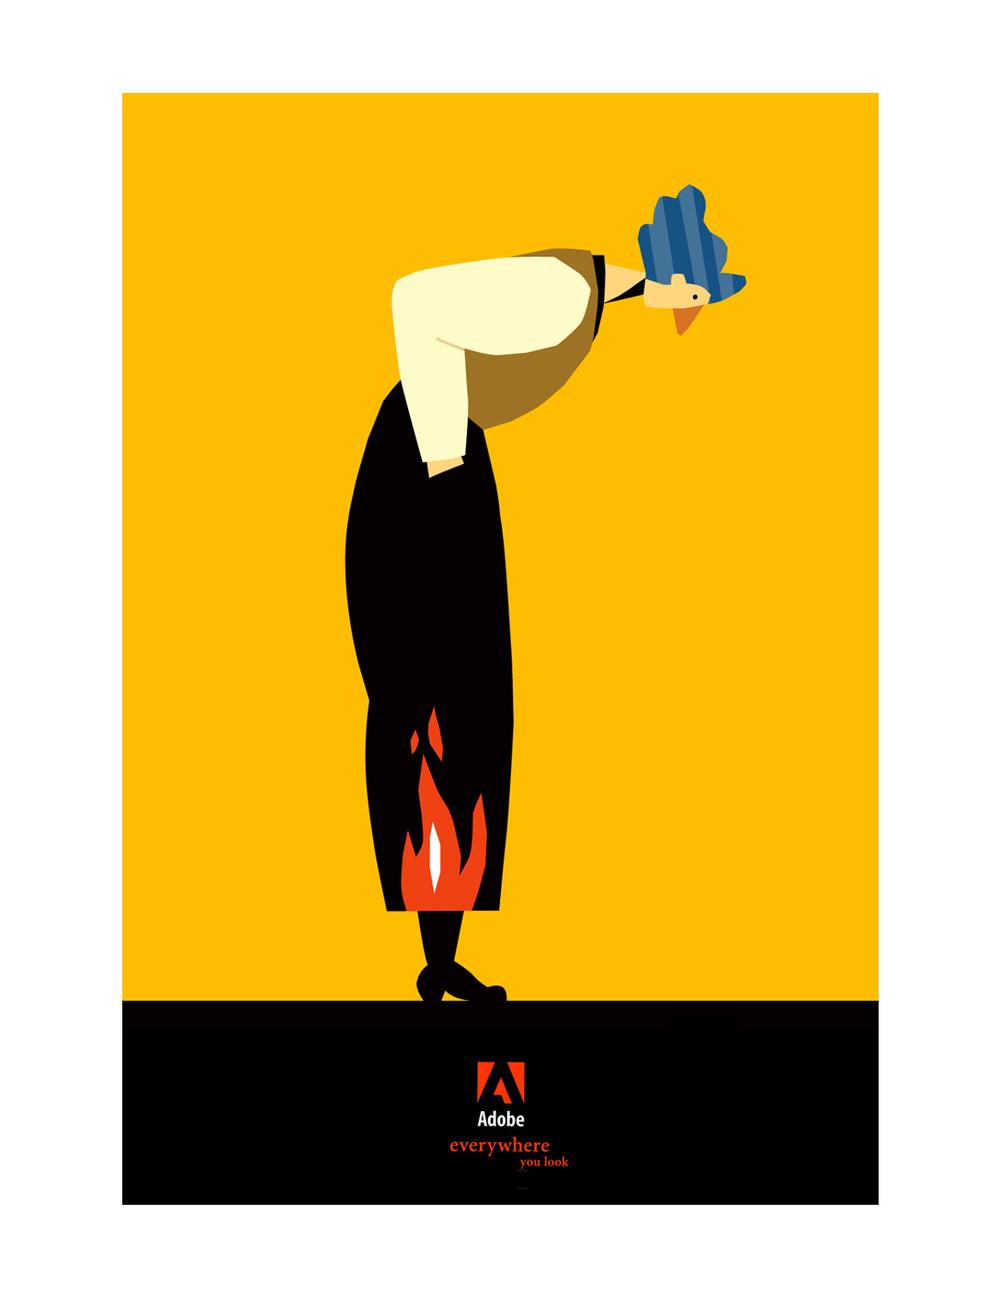 Adobe poster